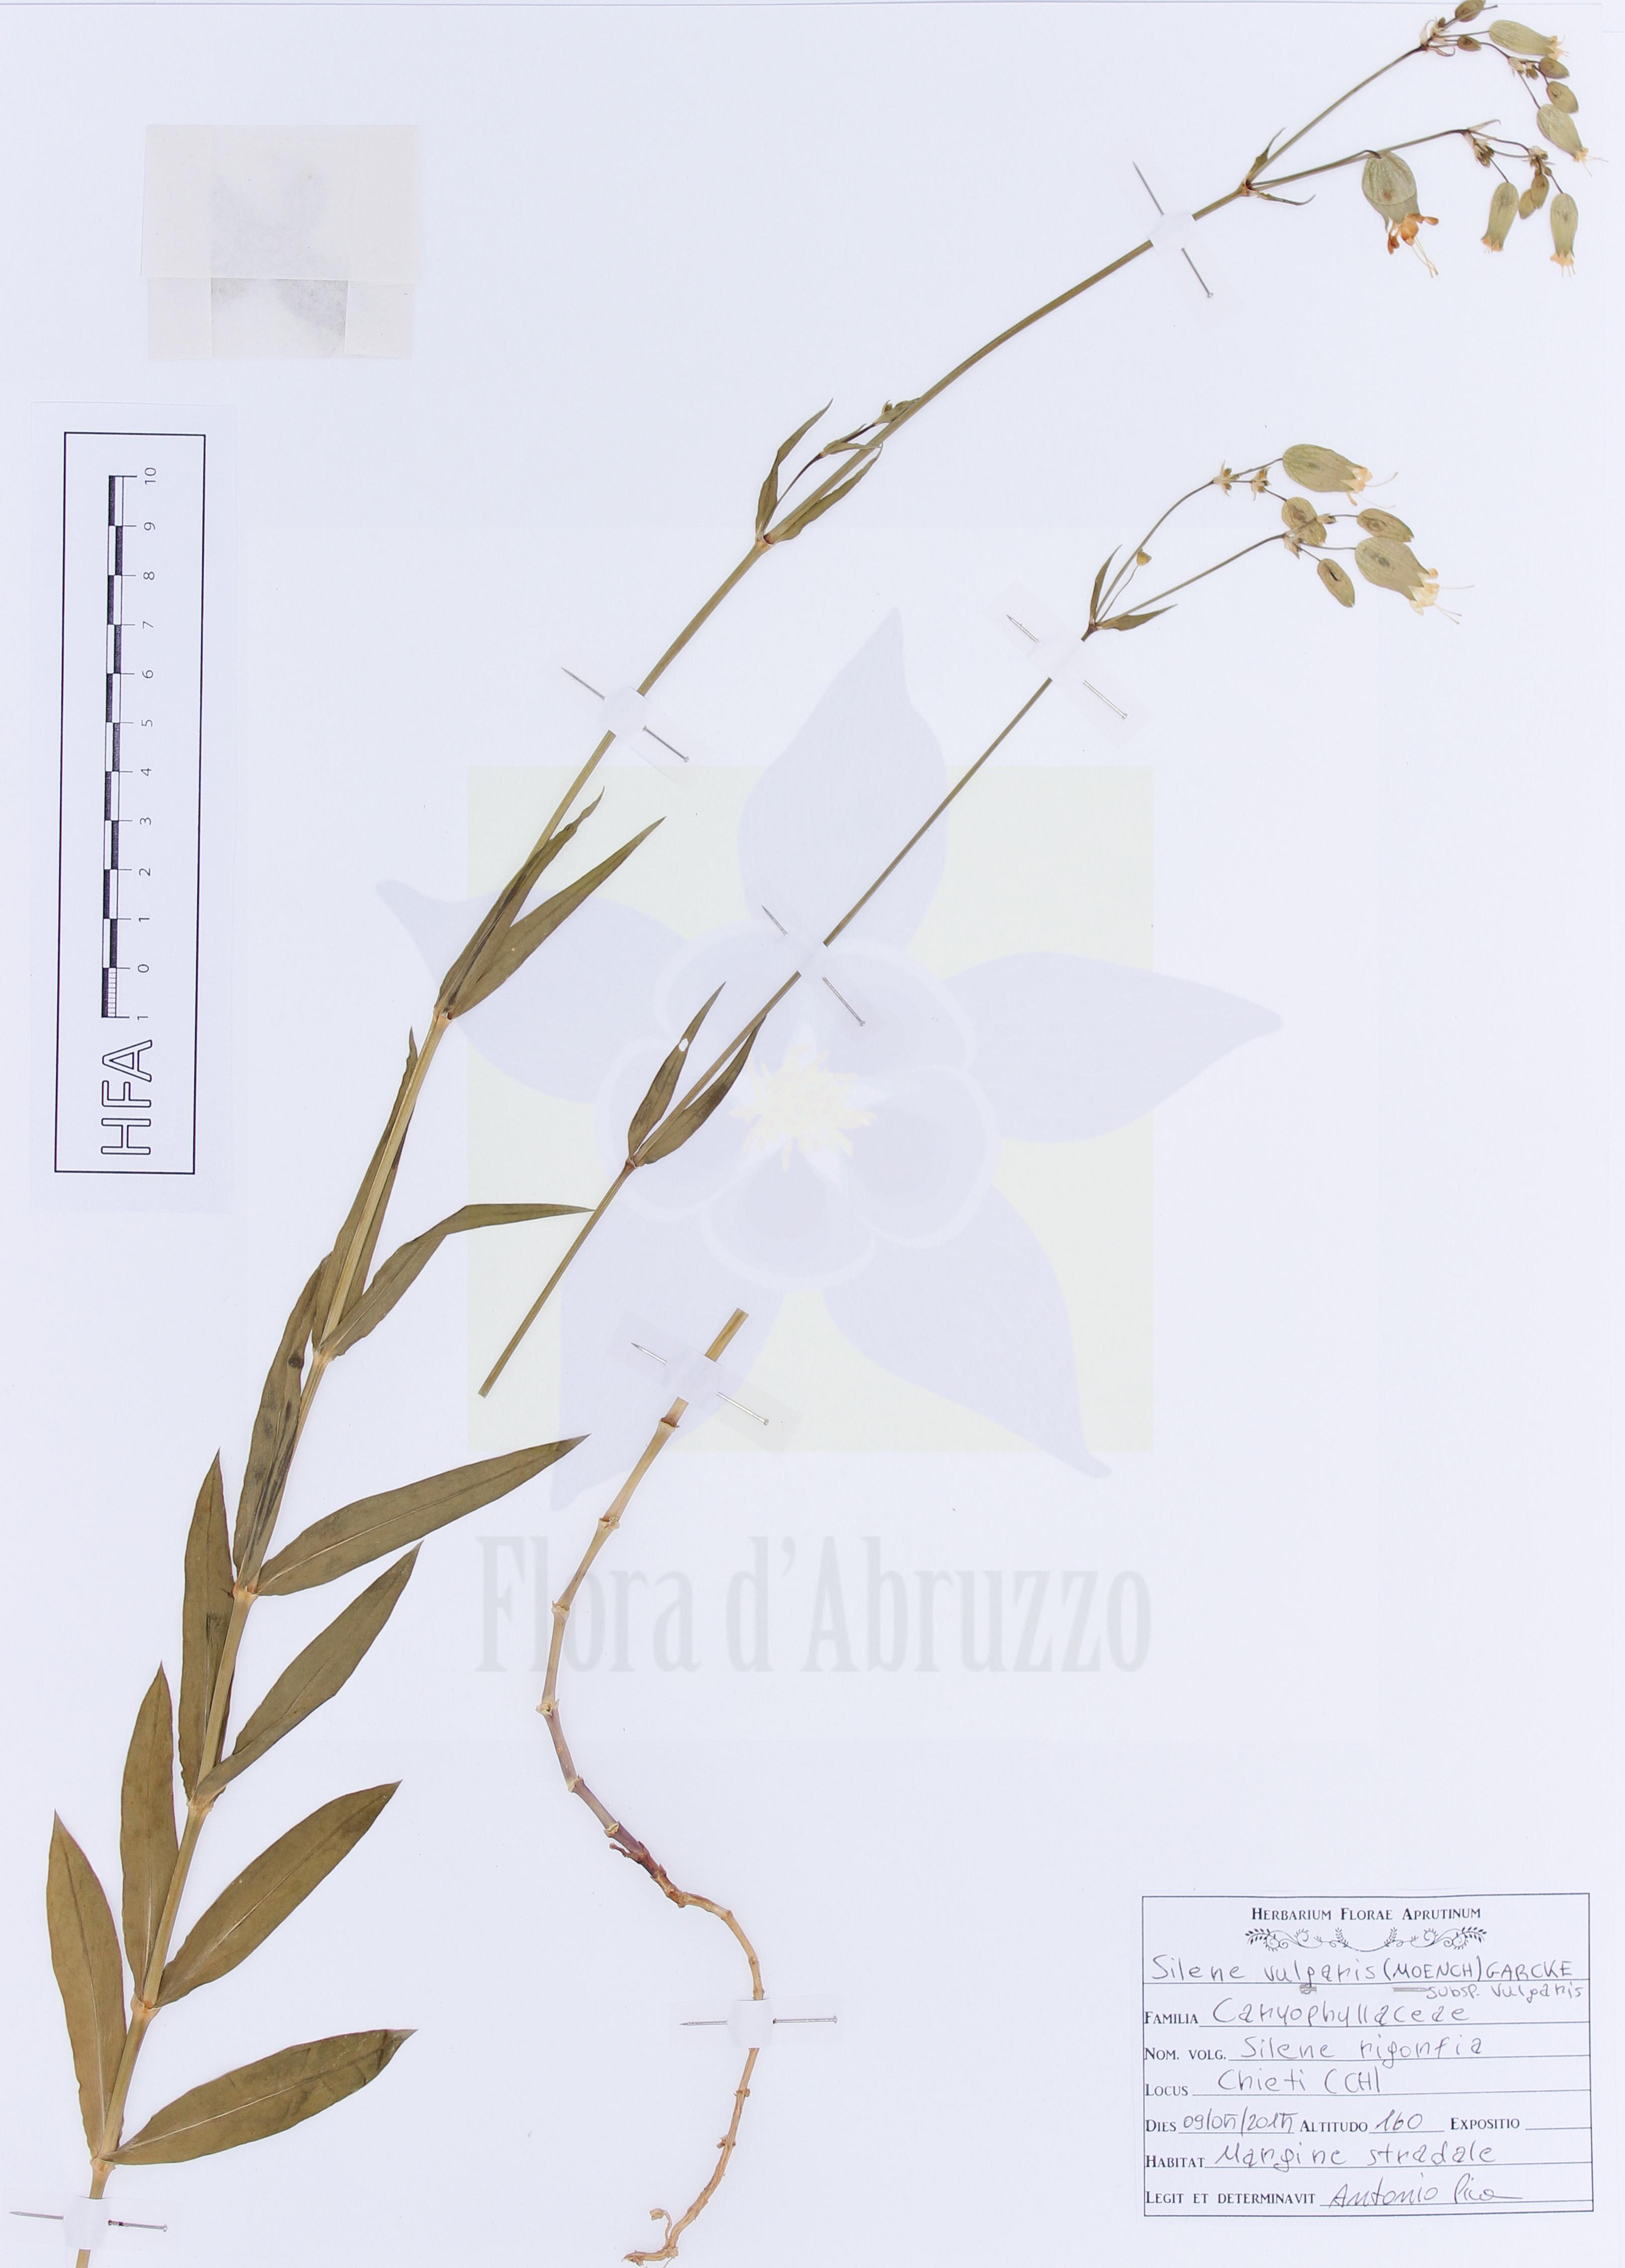 Silene vulgaris(Moench) Garcke subsp.vulgaris